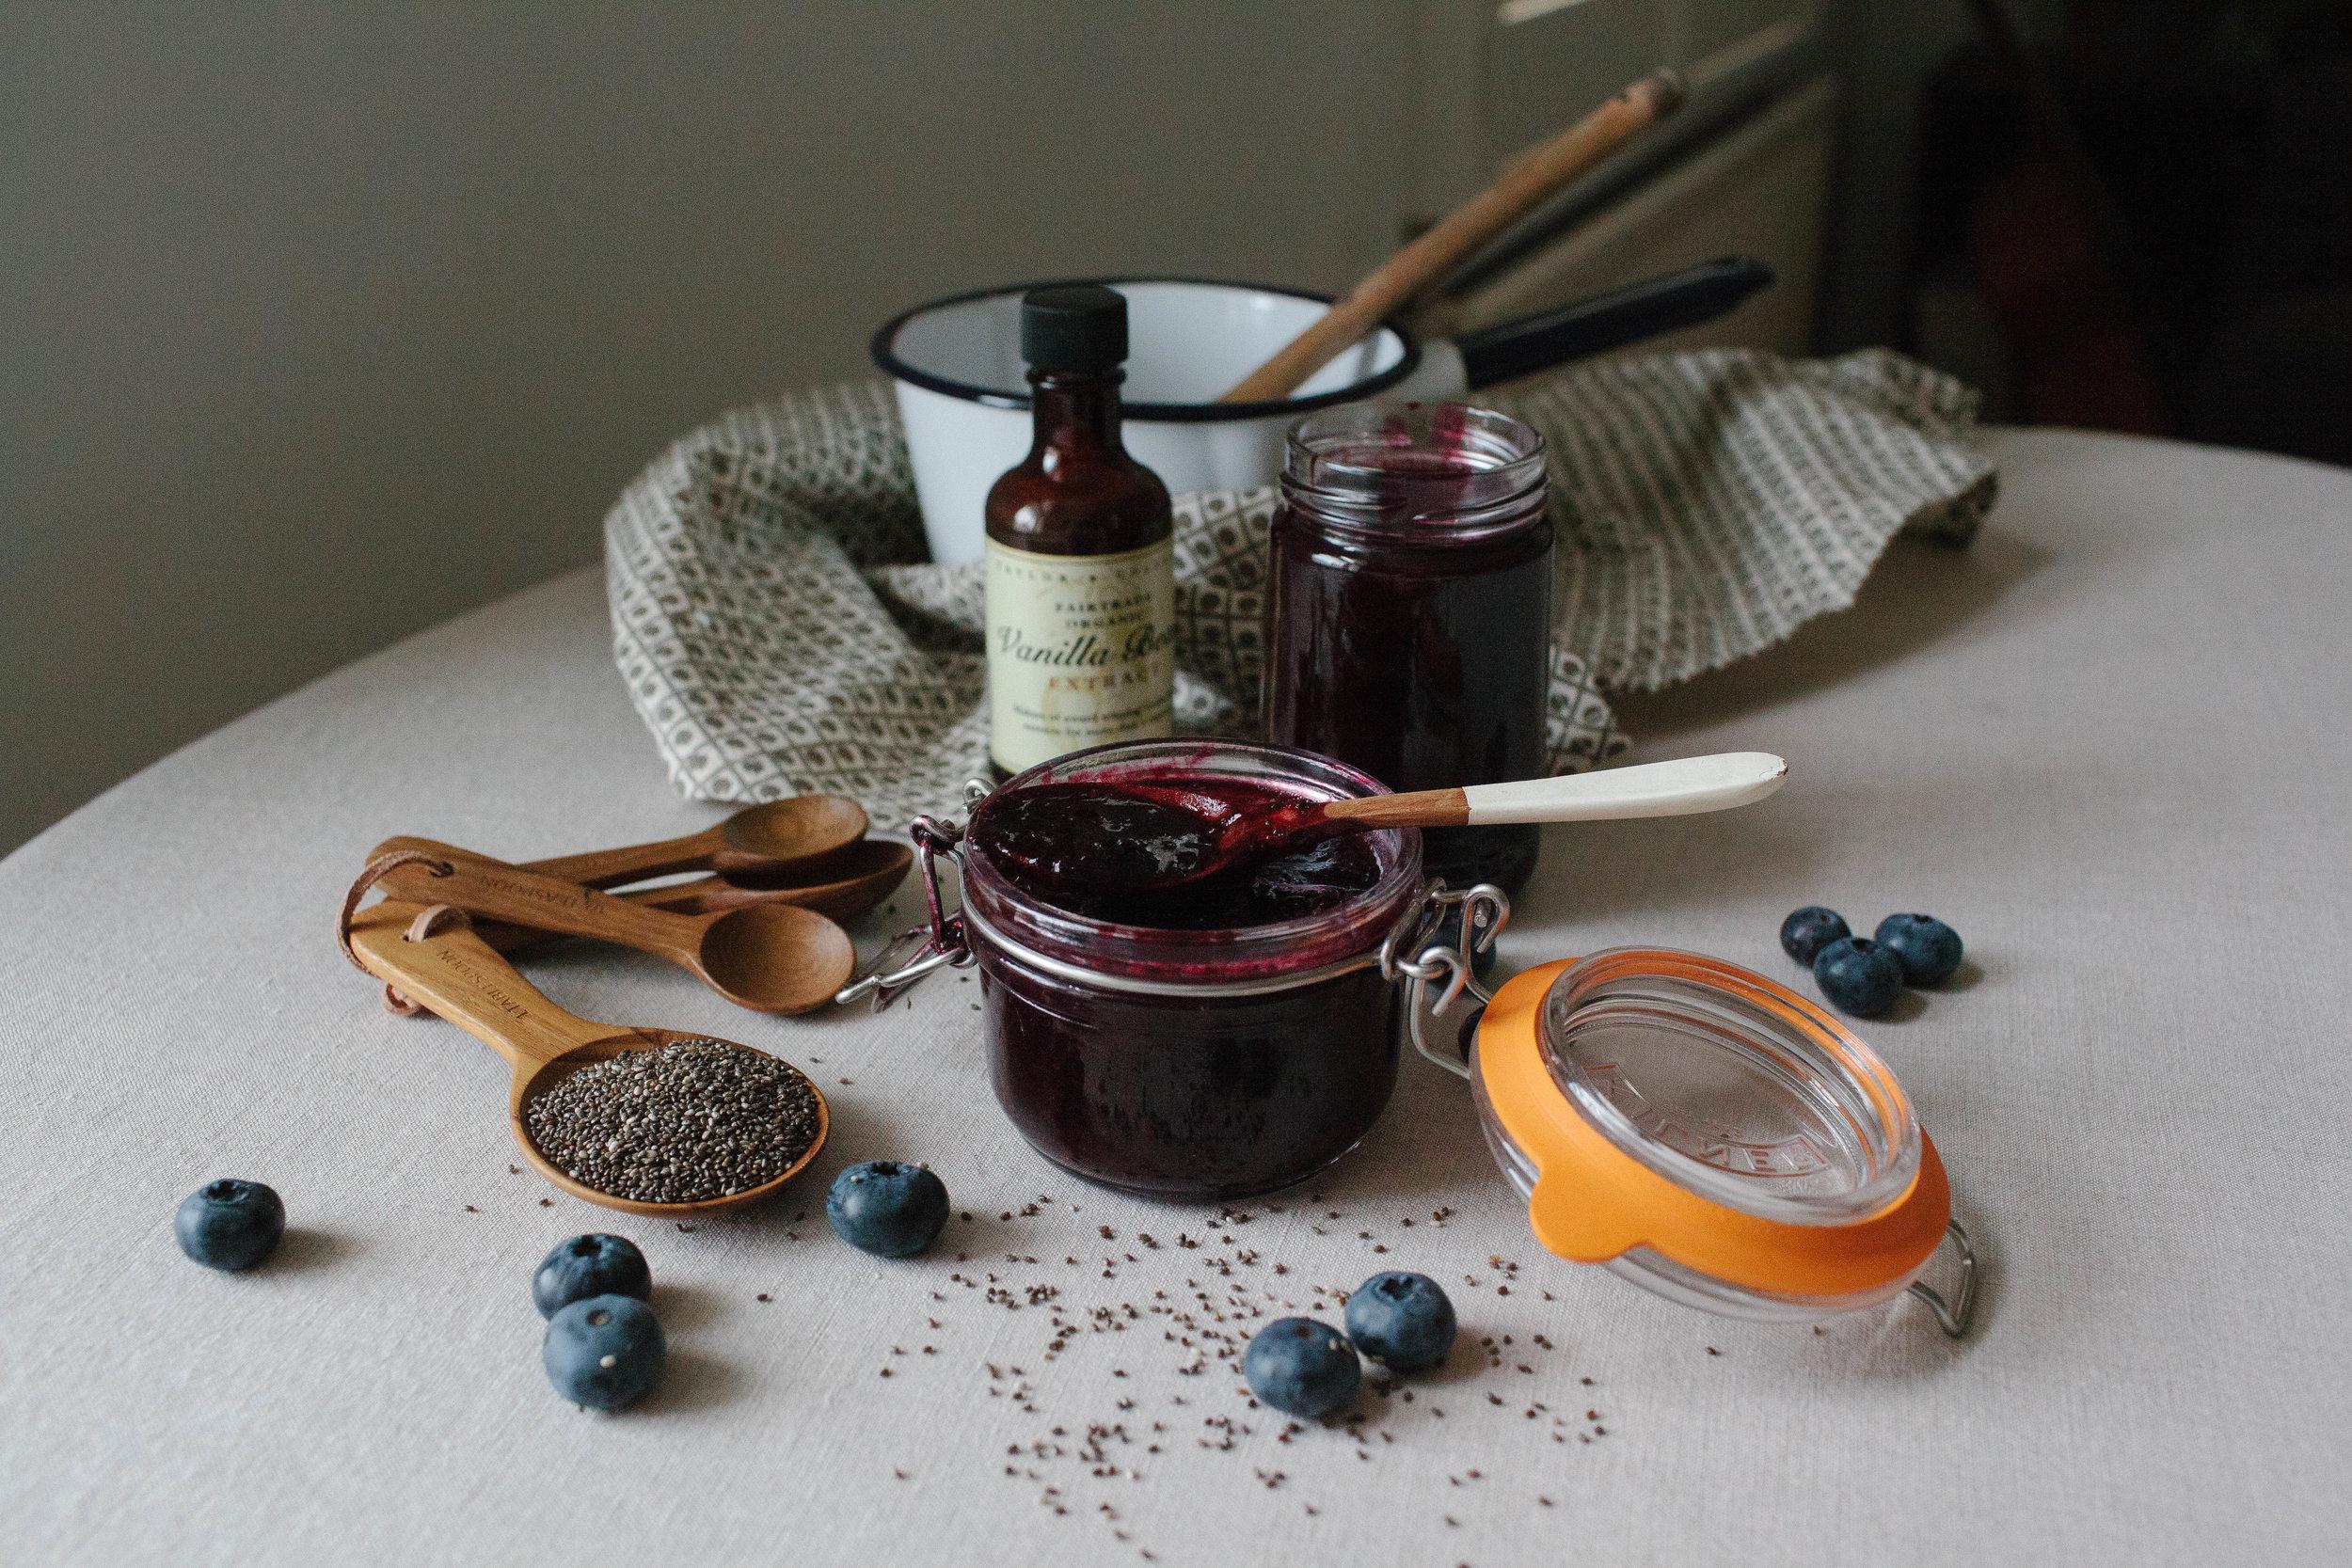 blueberry-vanilla-chia-jam-1.jpg